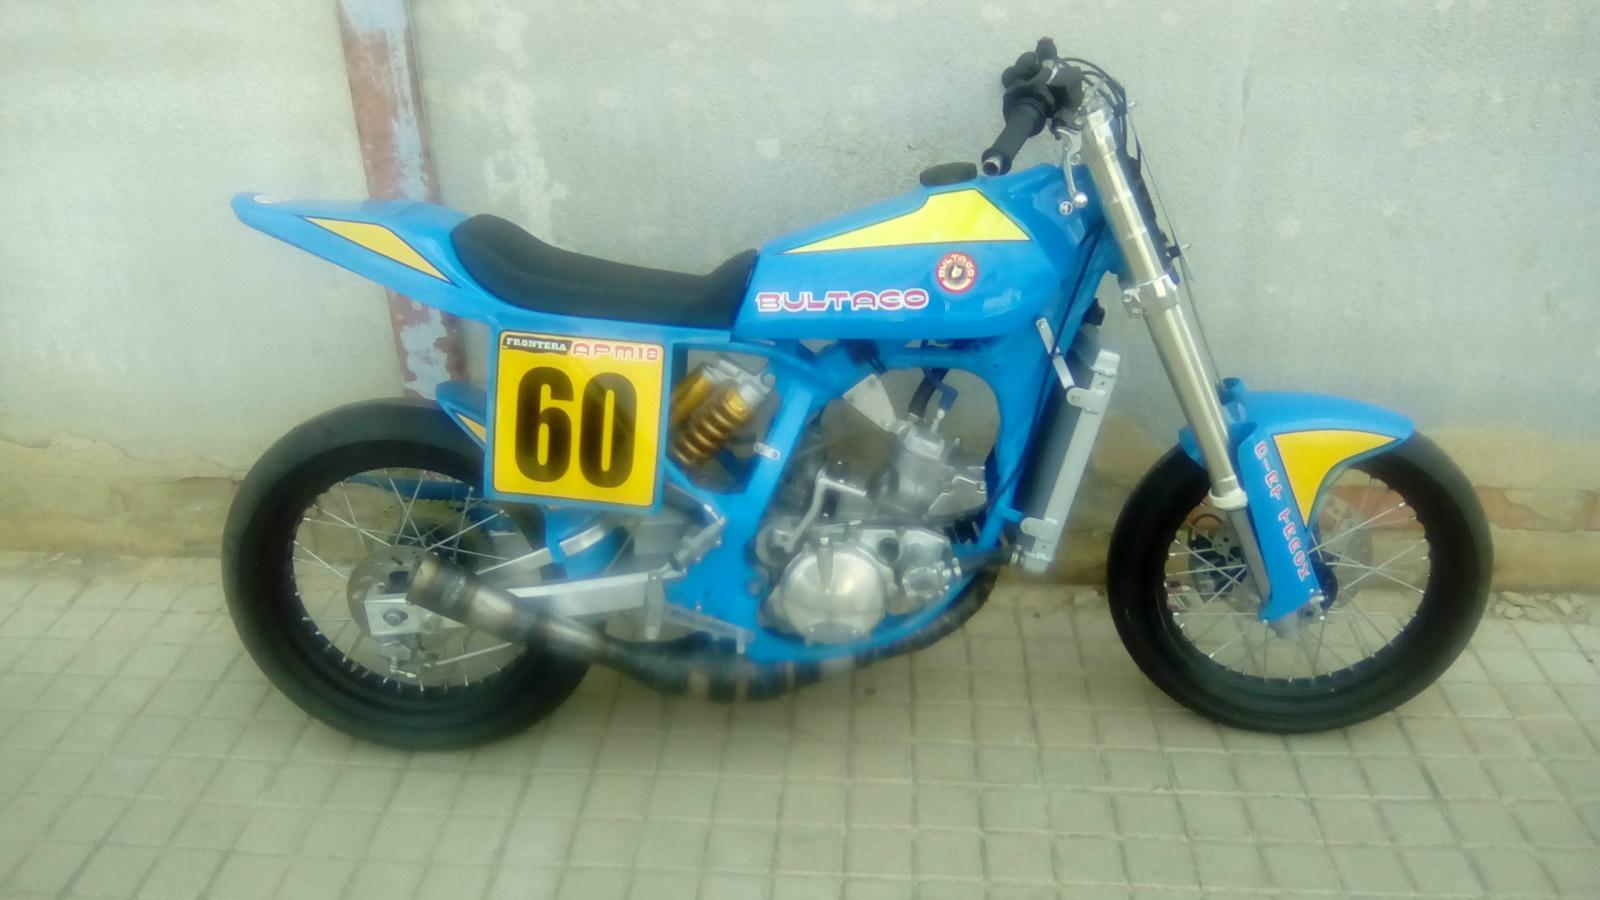 Bultaco Frontera APM18 Dirt-Trac 6pbz2x